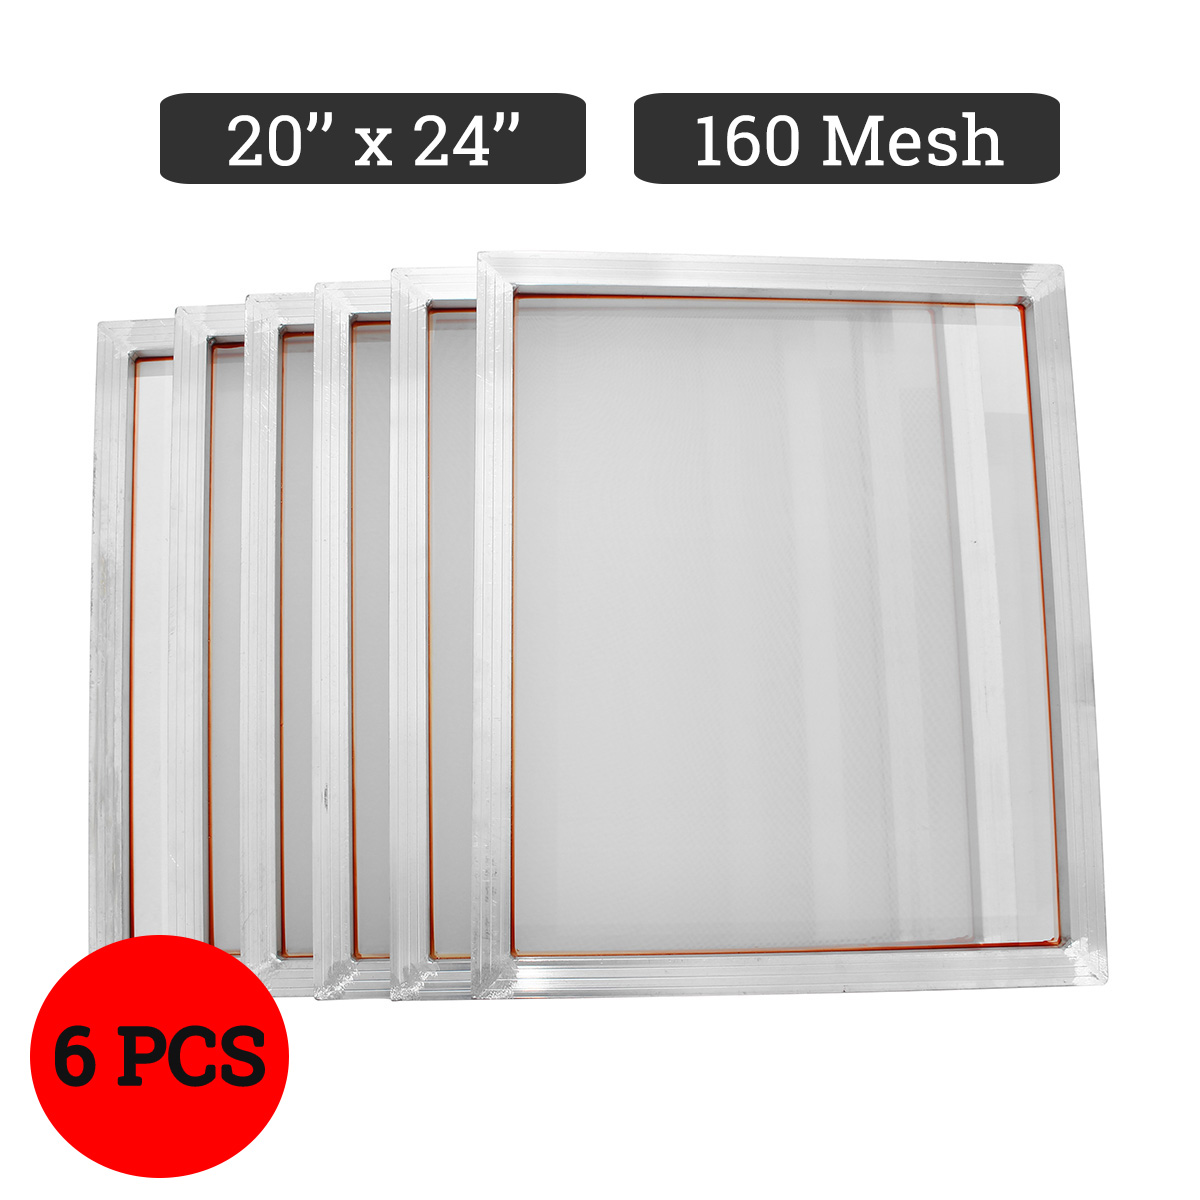 doersupp 6pcs/set 44x54cm Aluminum Silk Screen Printing Press Frame Screens White 160T Mesh Out Size 50x60cmdoersupp 6pcs/set 44x54cm Aluminum Silk Screen Printing Press Frame Screens White 160T Mesh Out Size 50x60cm